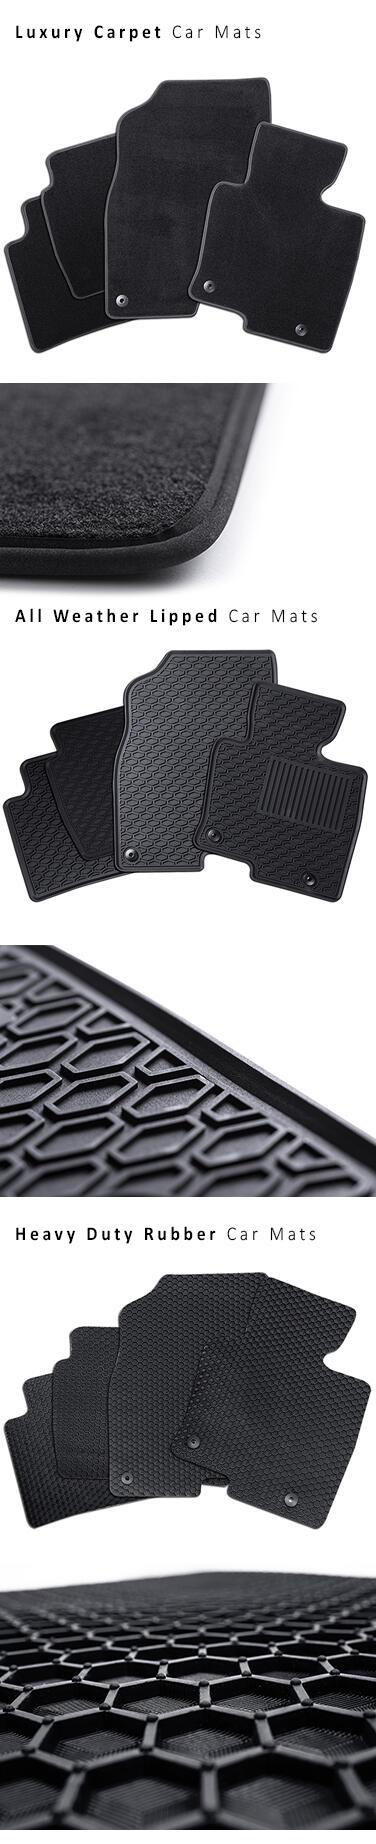 car mats lux 2